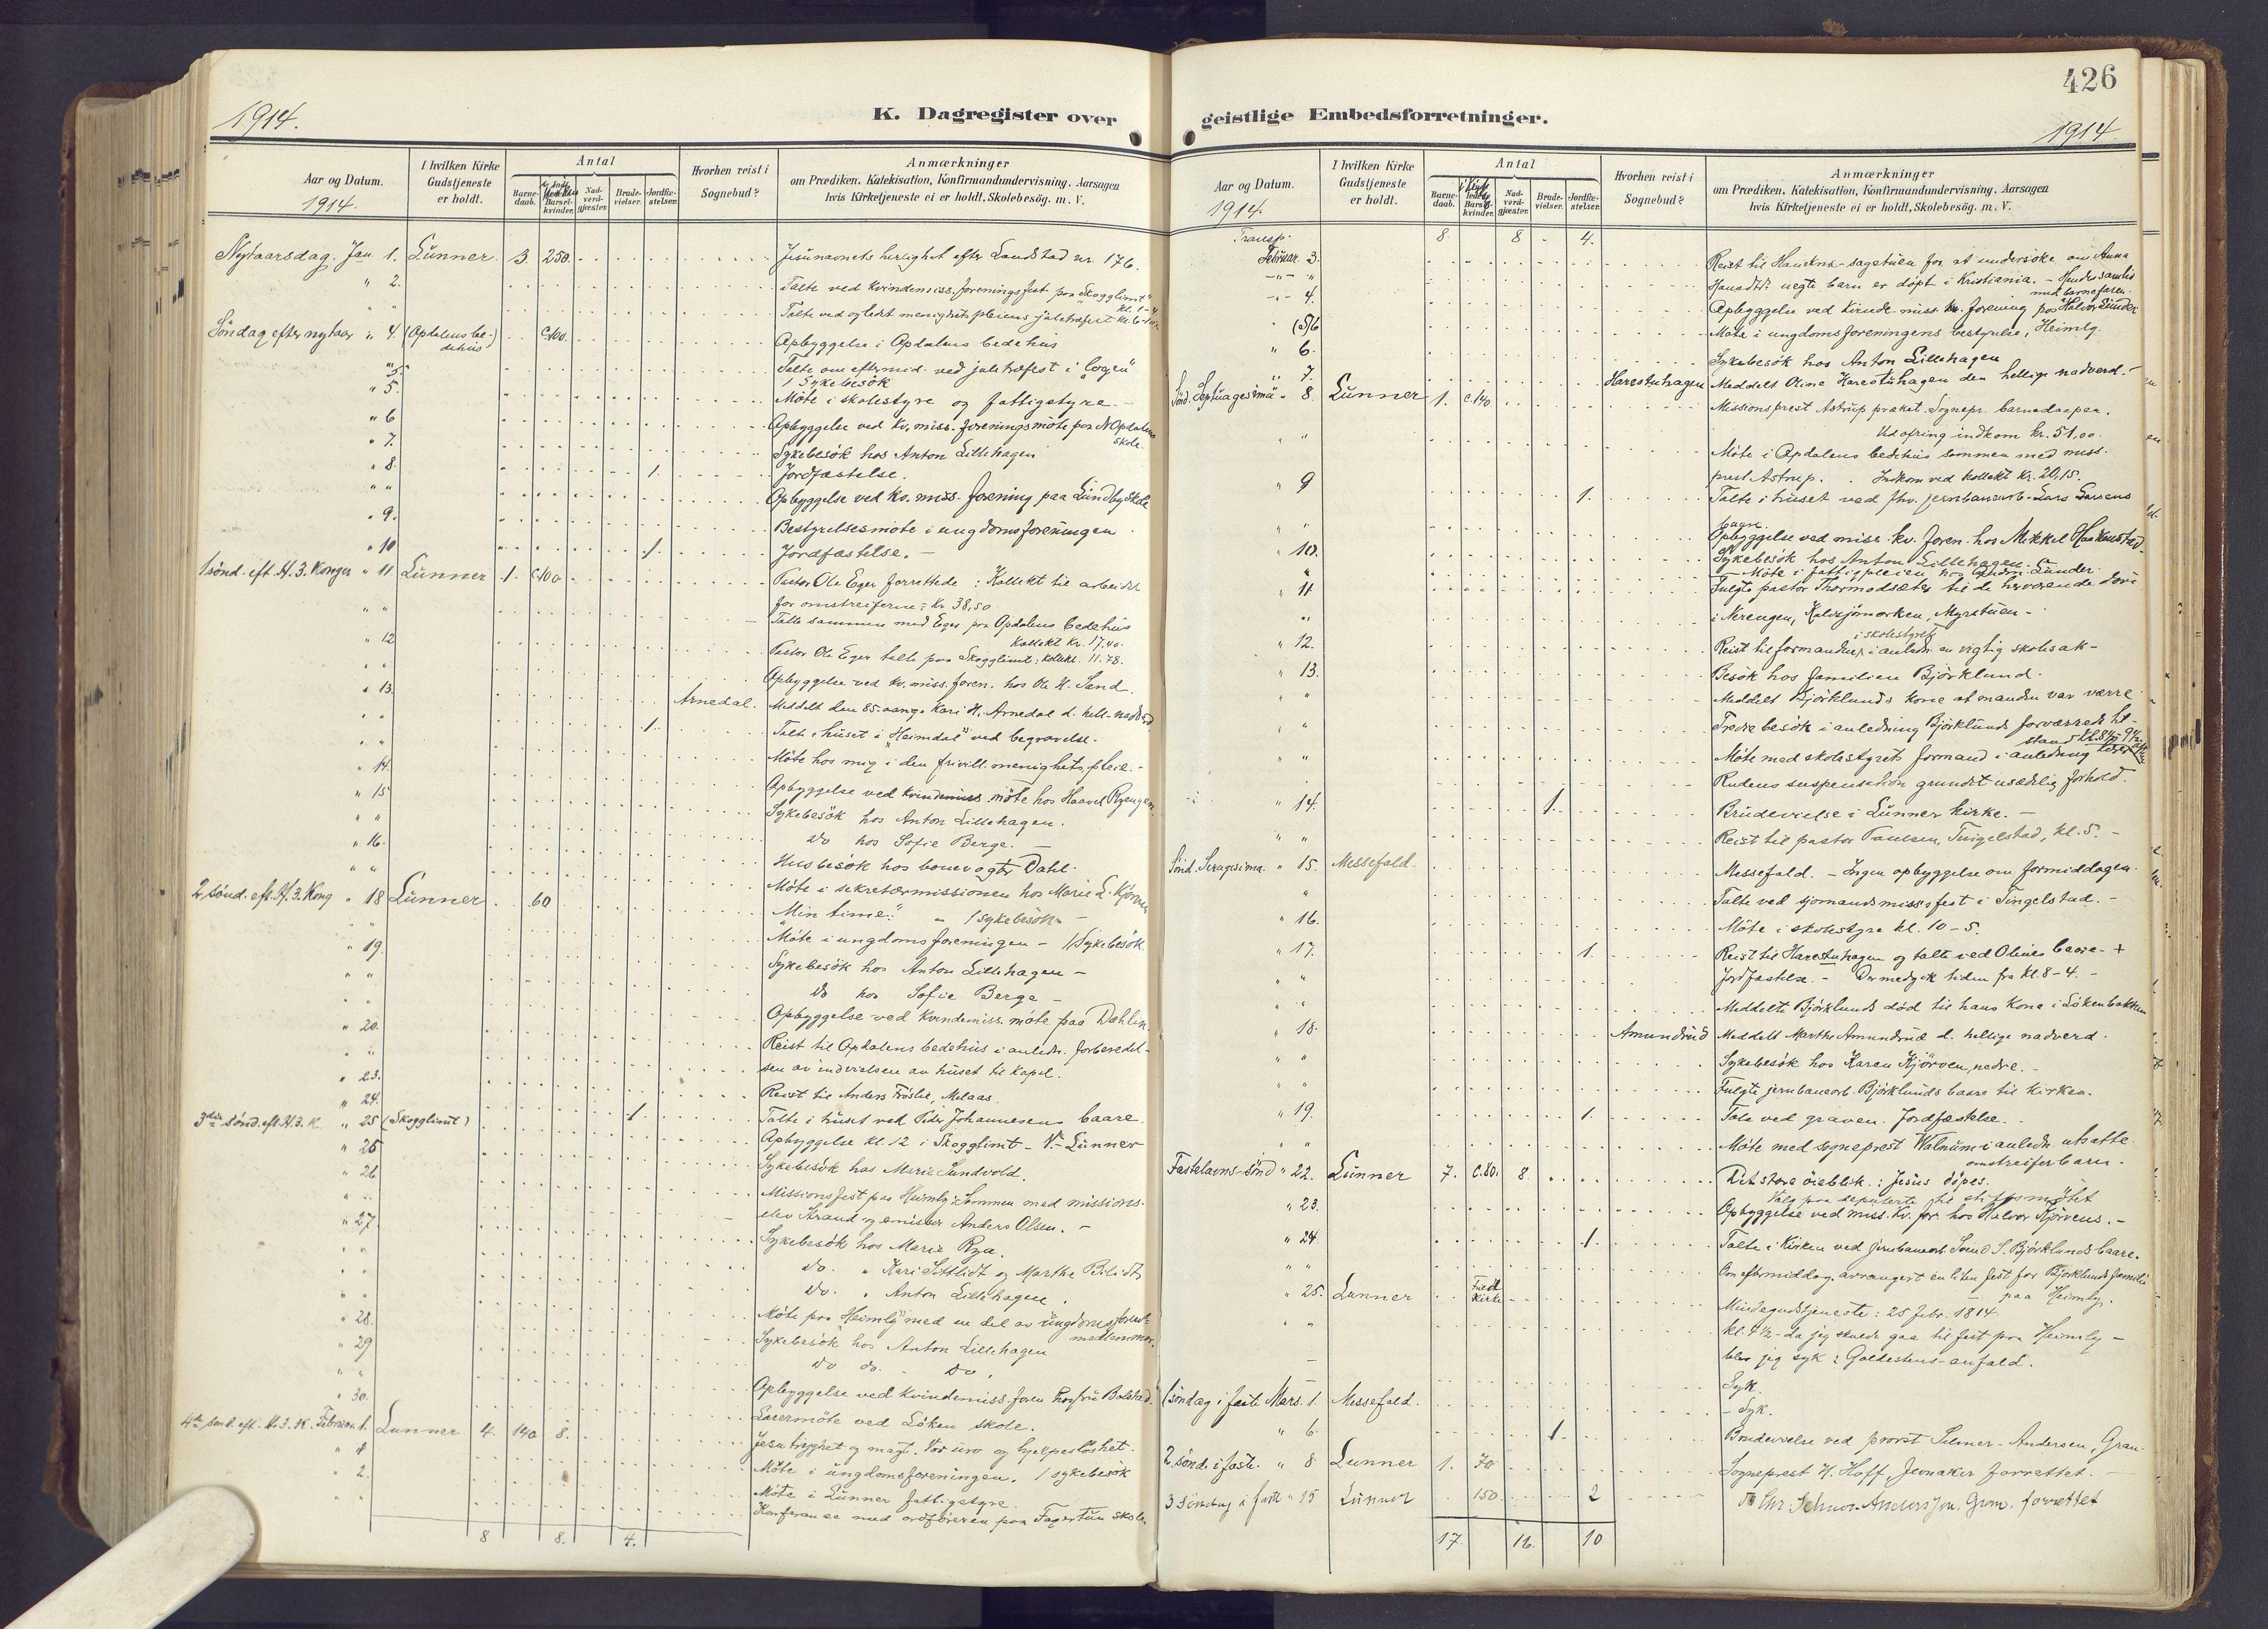 SAH, Lunner prestekontor, H/Ha/Haa/L0001: Ministerialbok nr. 1, 1907-1922, s. 426